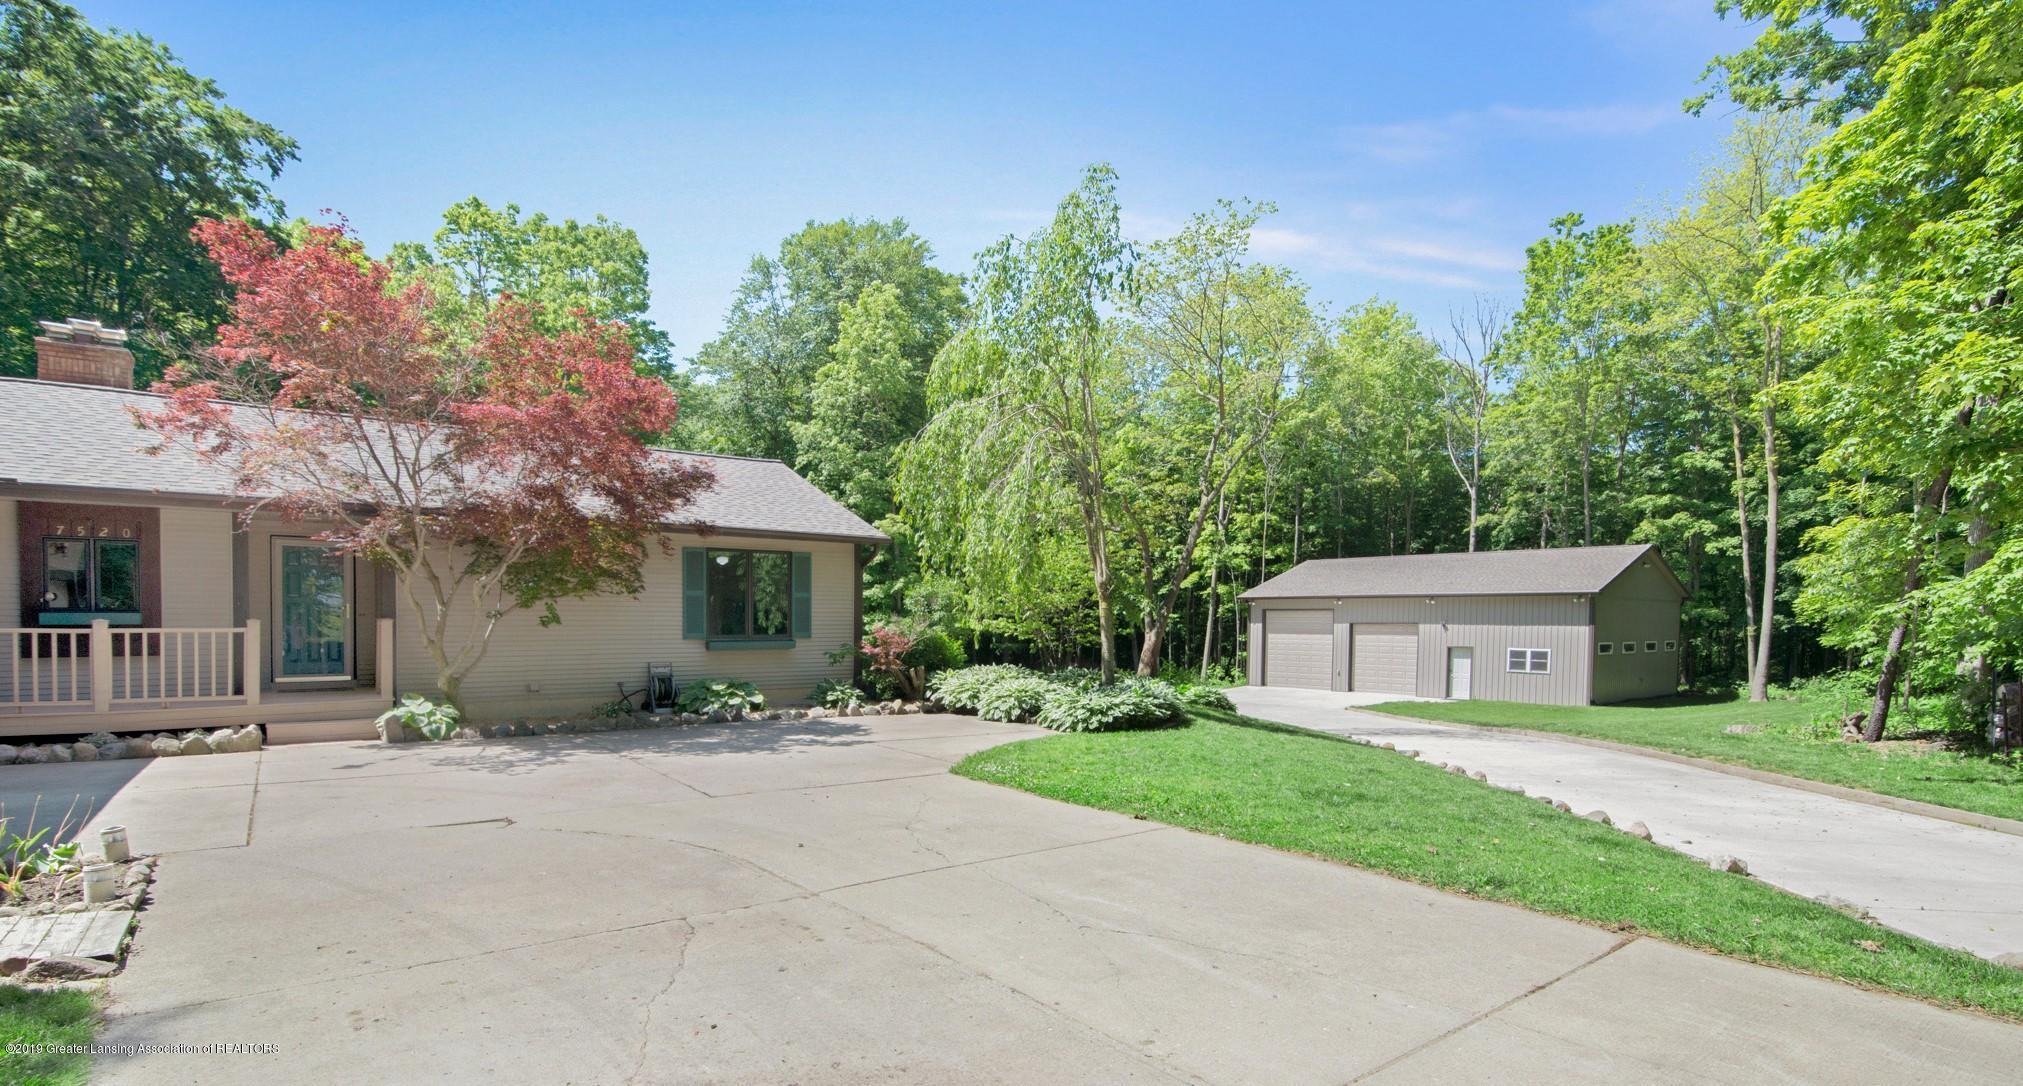 7520 Carmel Ln - Home, Pole Barn & Acreage - 3